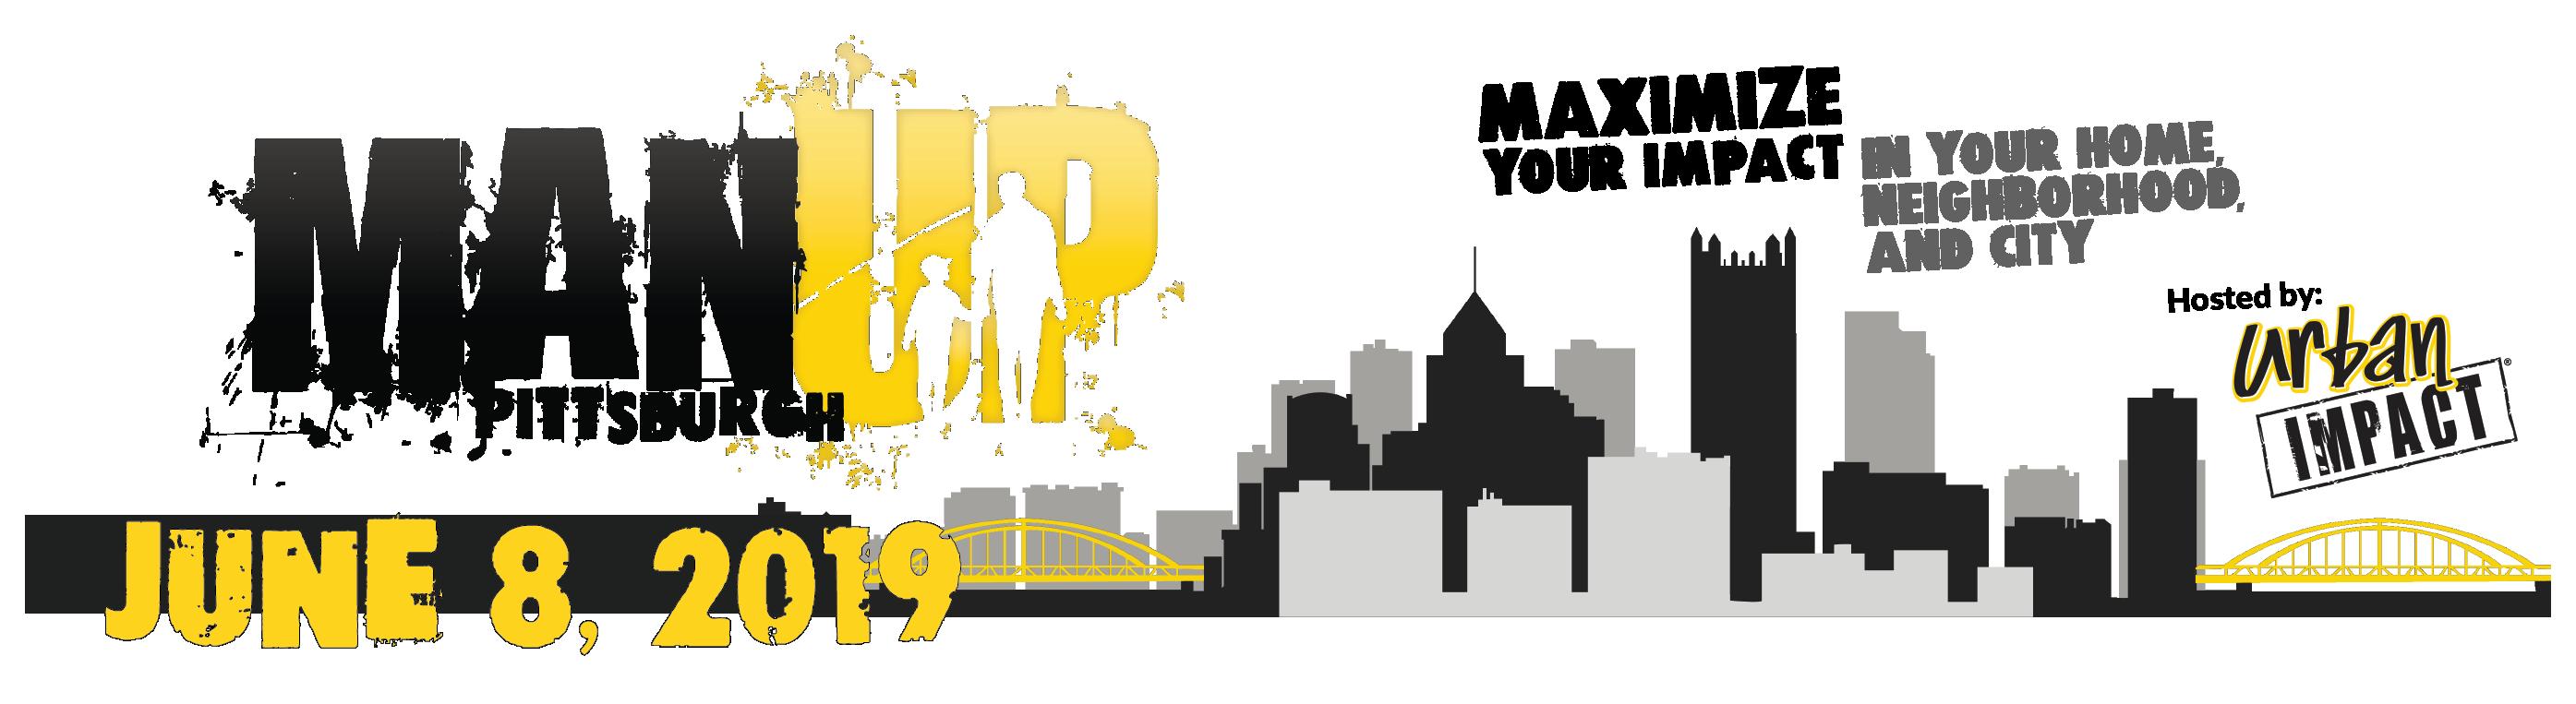 ManUp Pittsburgh 2017